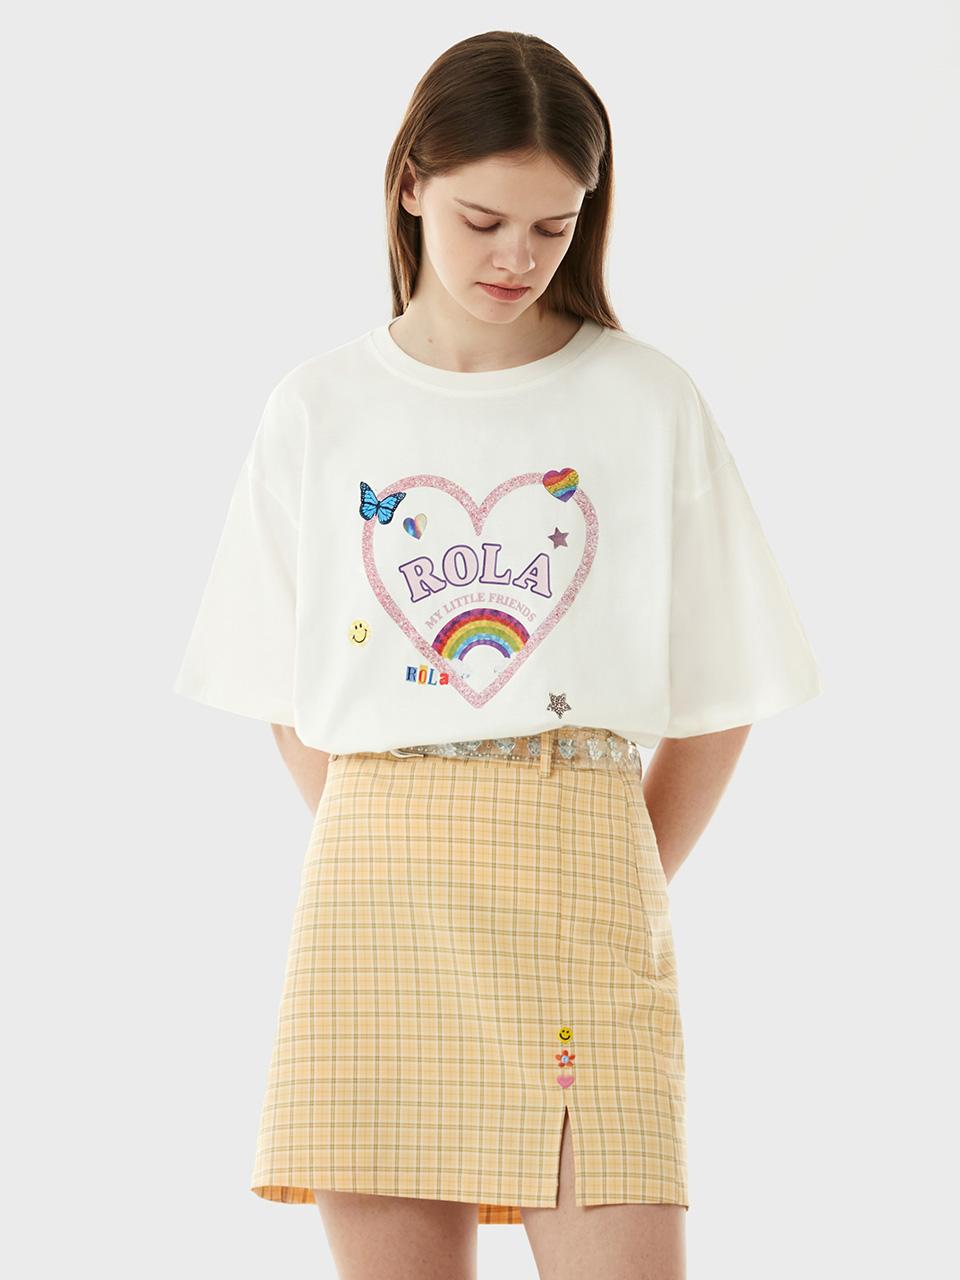 (TS-21306) ROLA RAINBOW HEART T-SHIRT WHITE